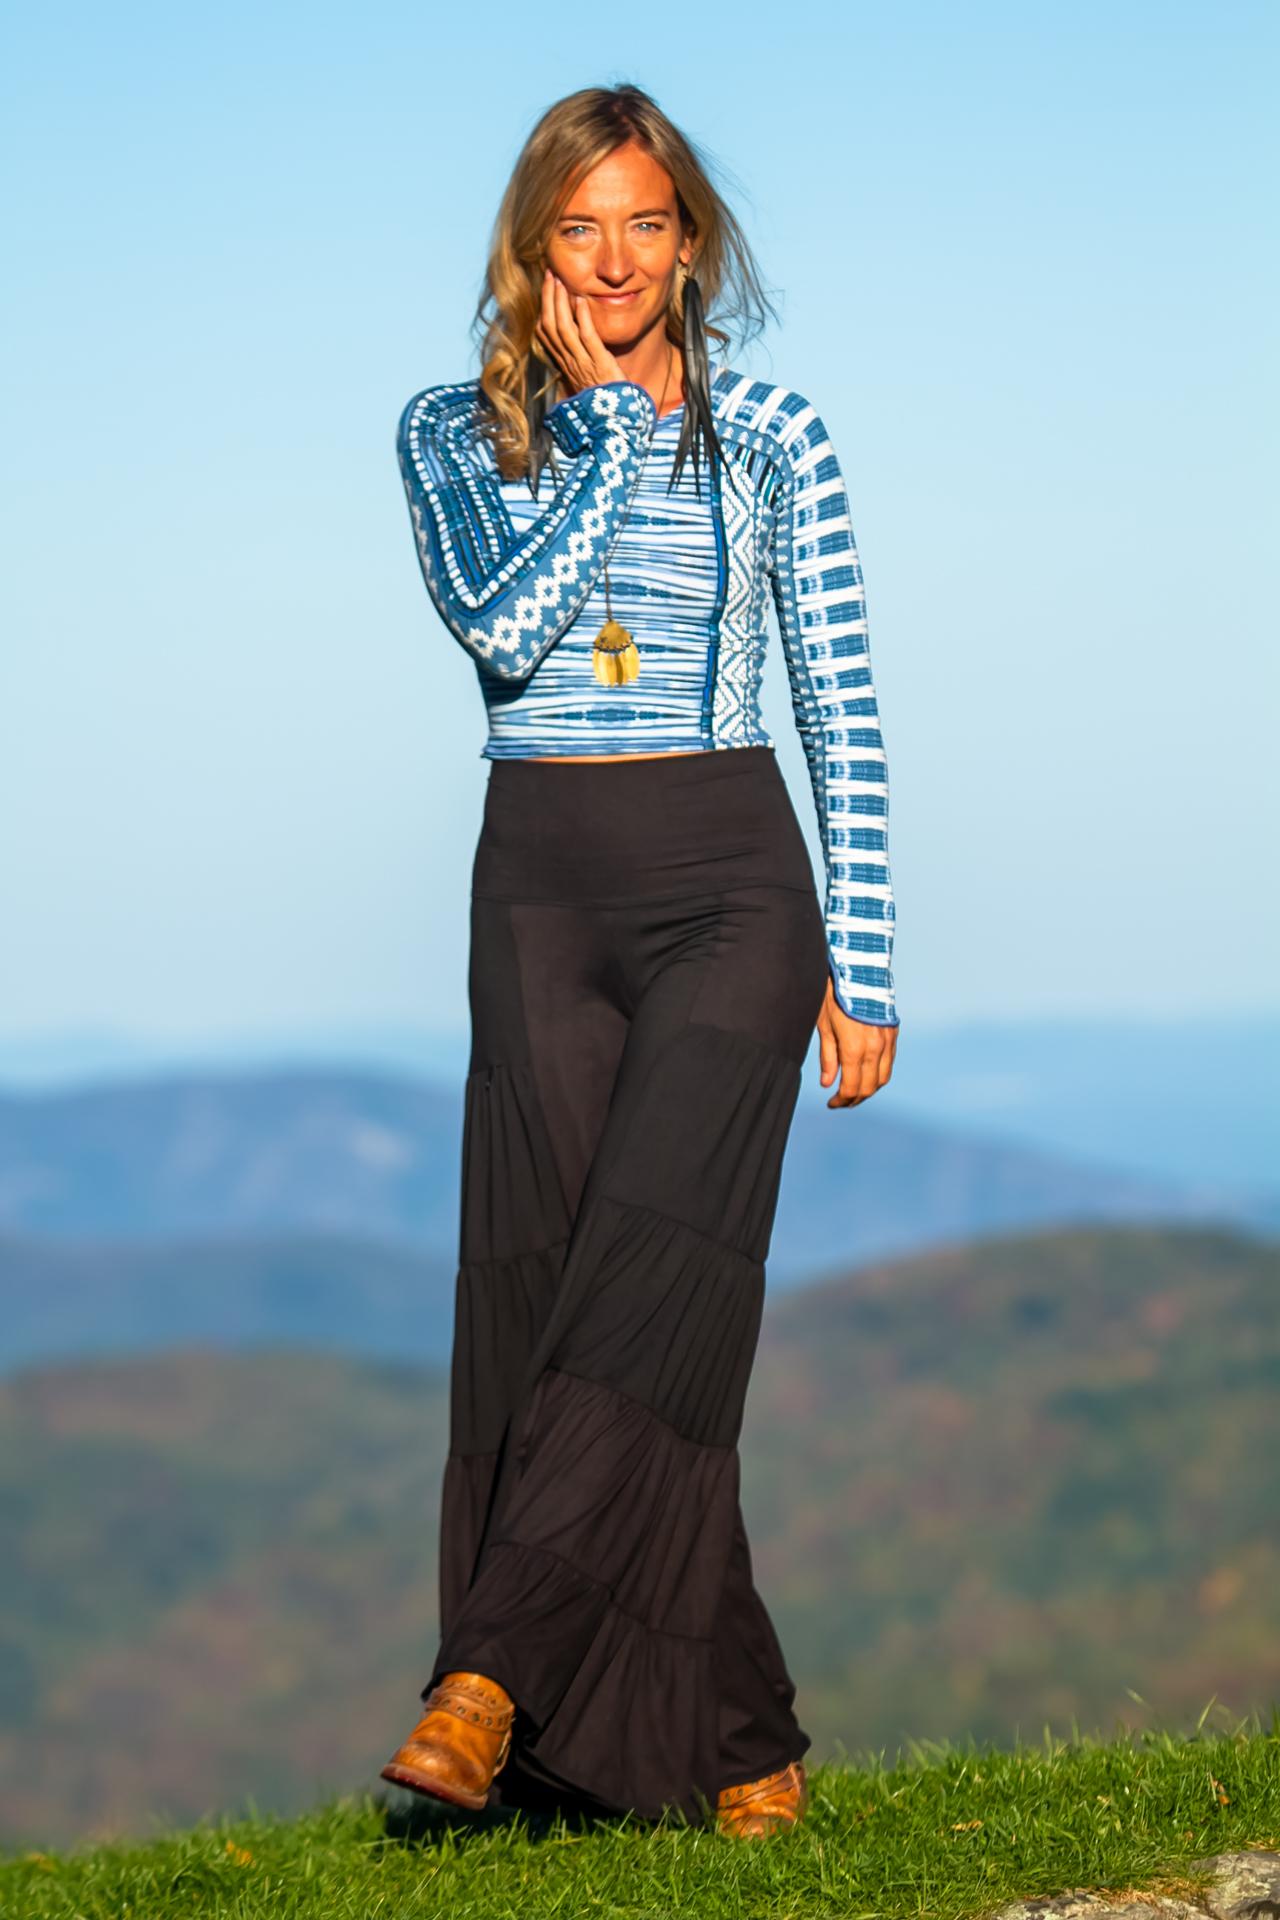 Fashion Design Autumn Teneyl wearing a boho style look by Autumn Teneyl Designs featuring a Wide legged black pant with a crop top.